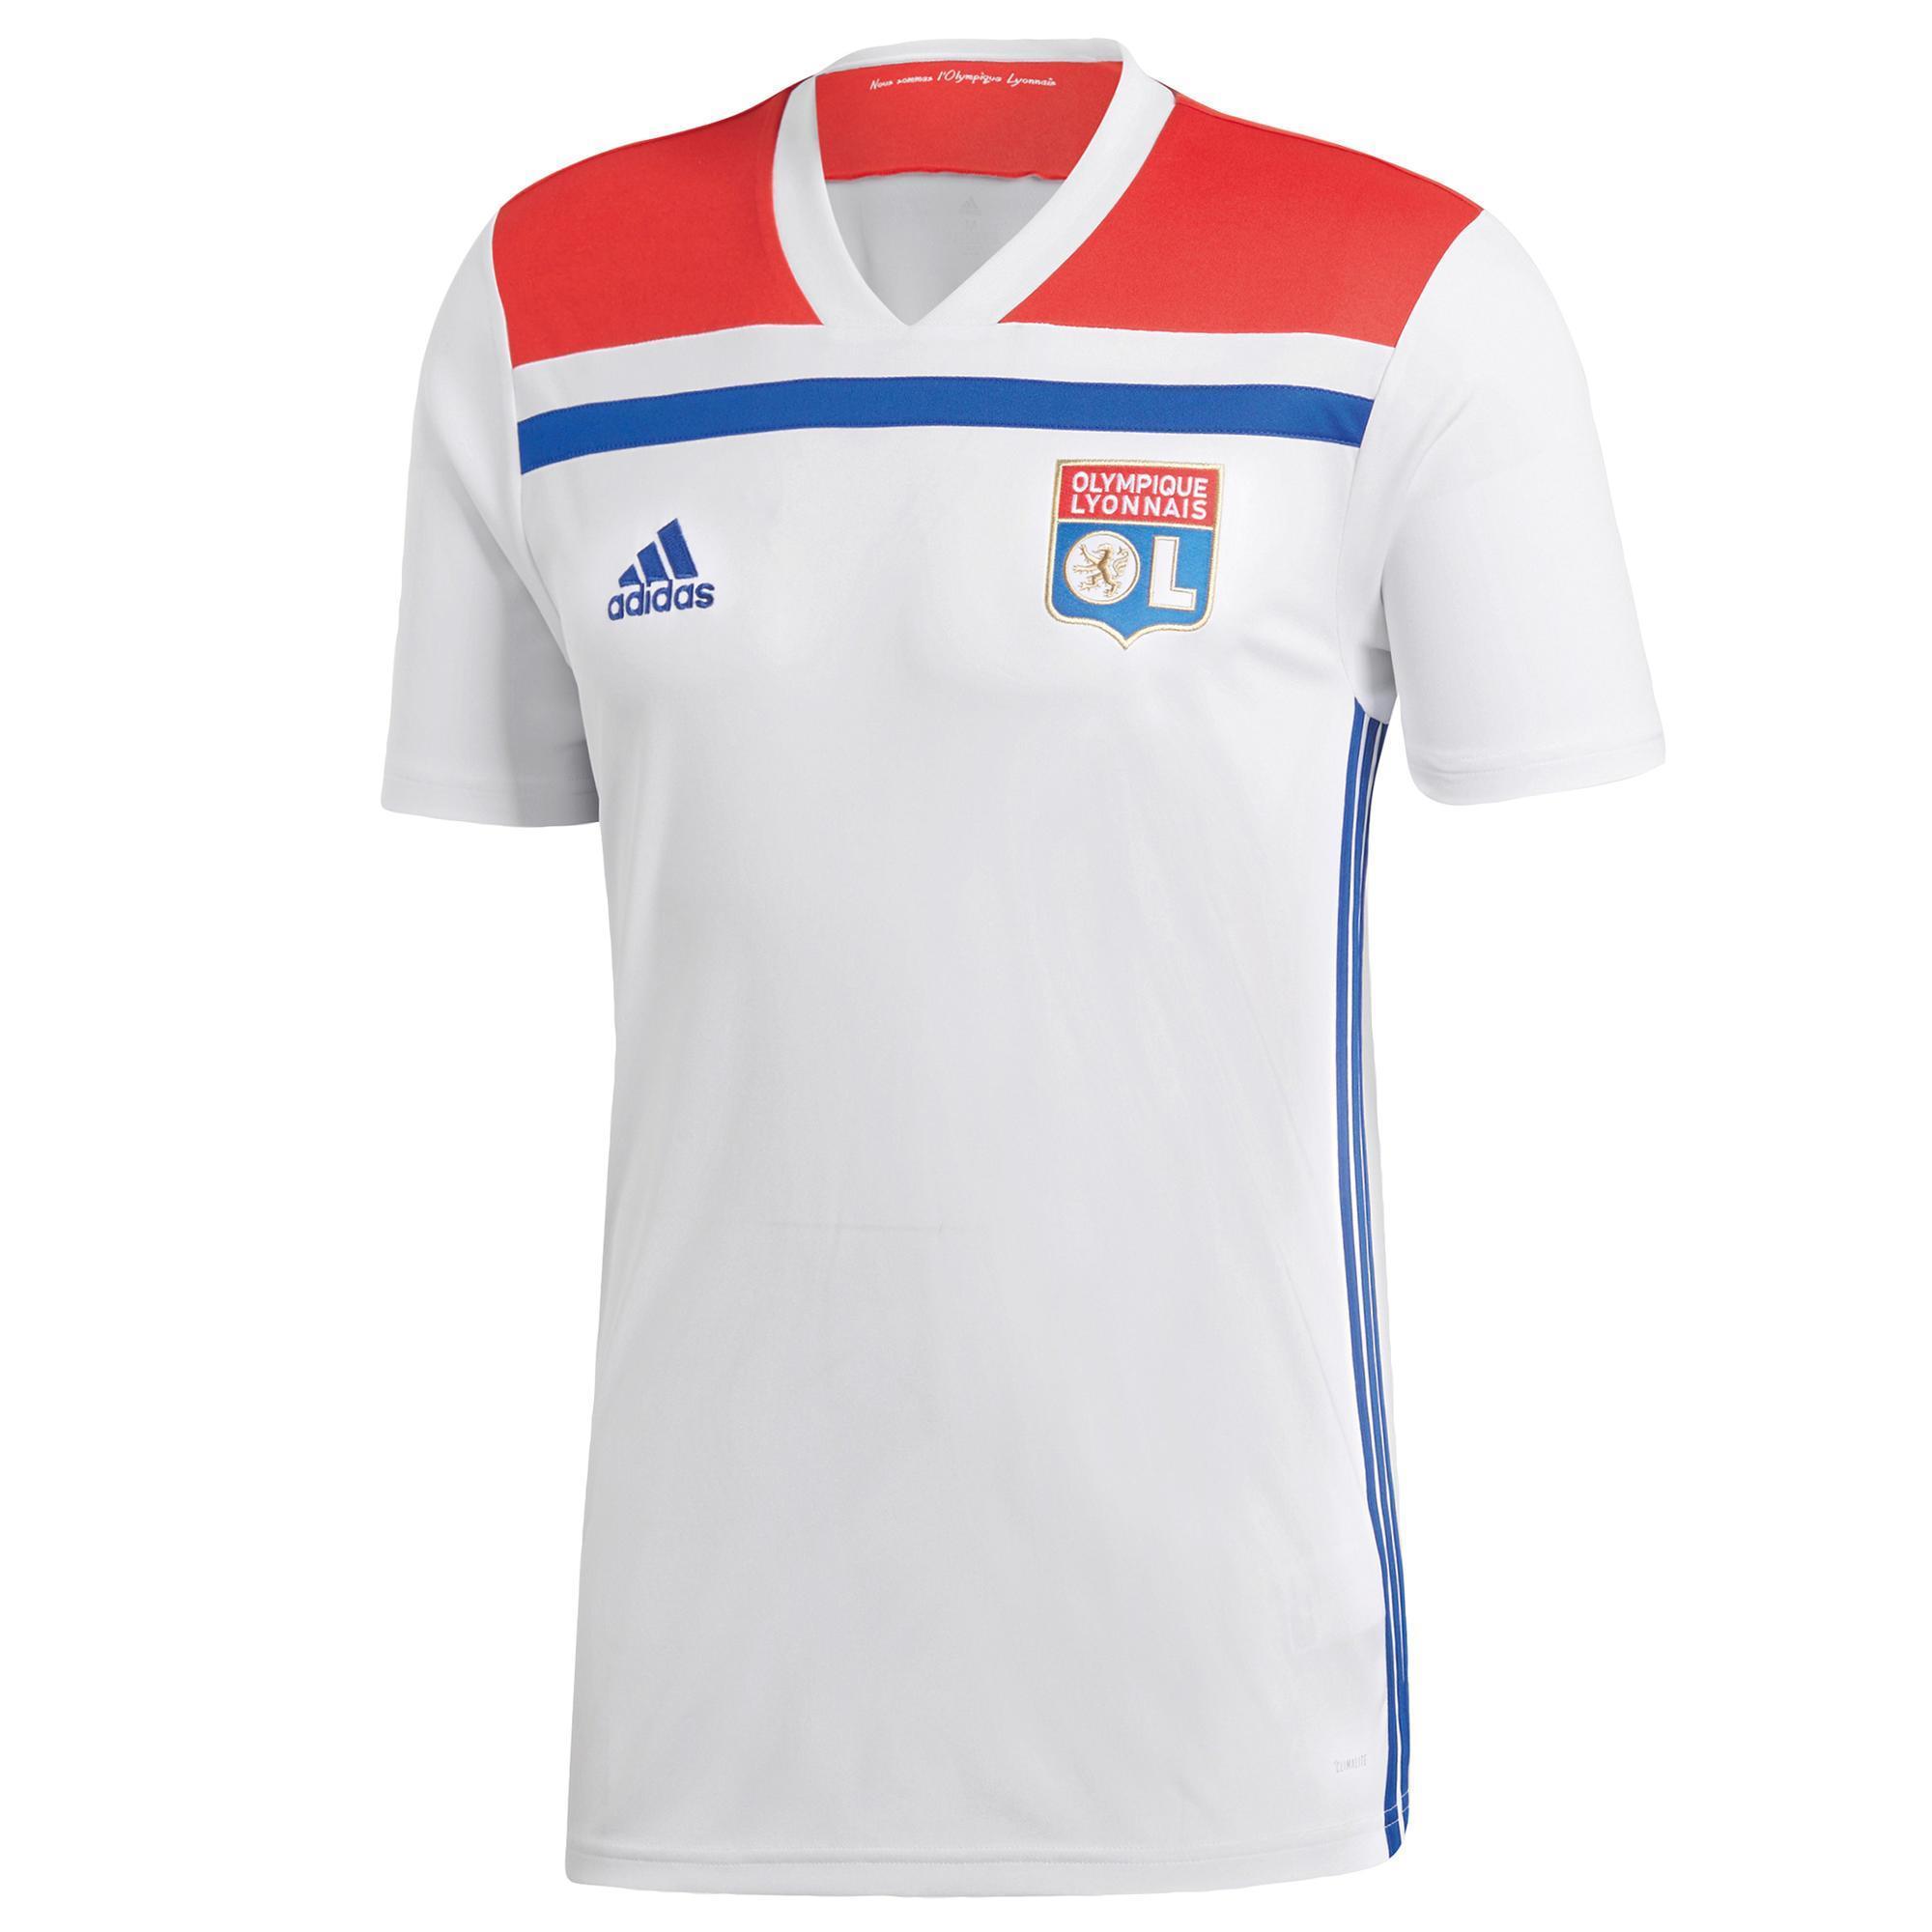 adidas Olympique Lyonnais Extérieur Replica Maillot de Football Homme Vêtements